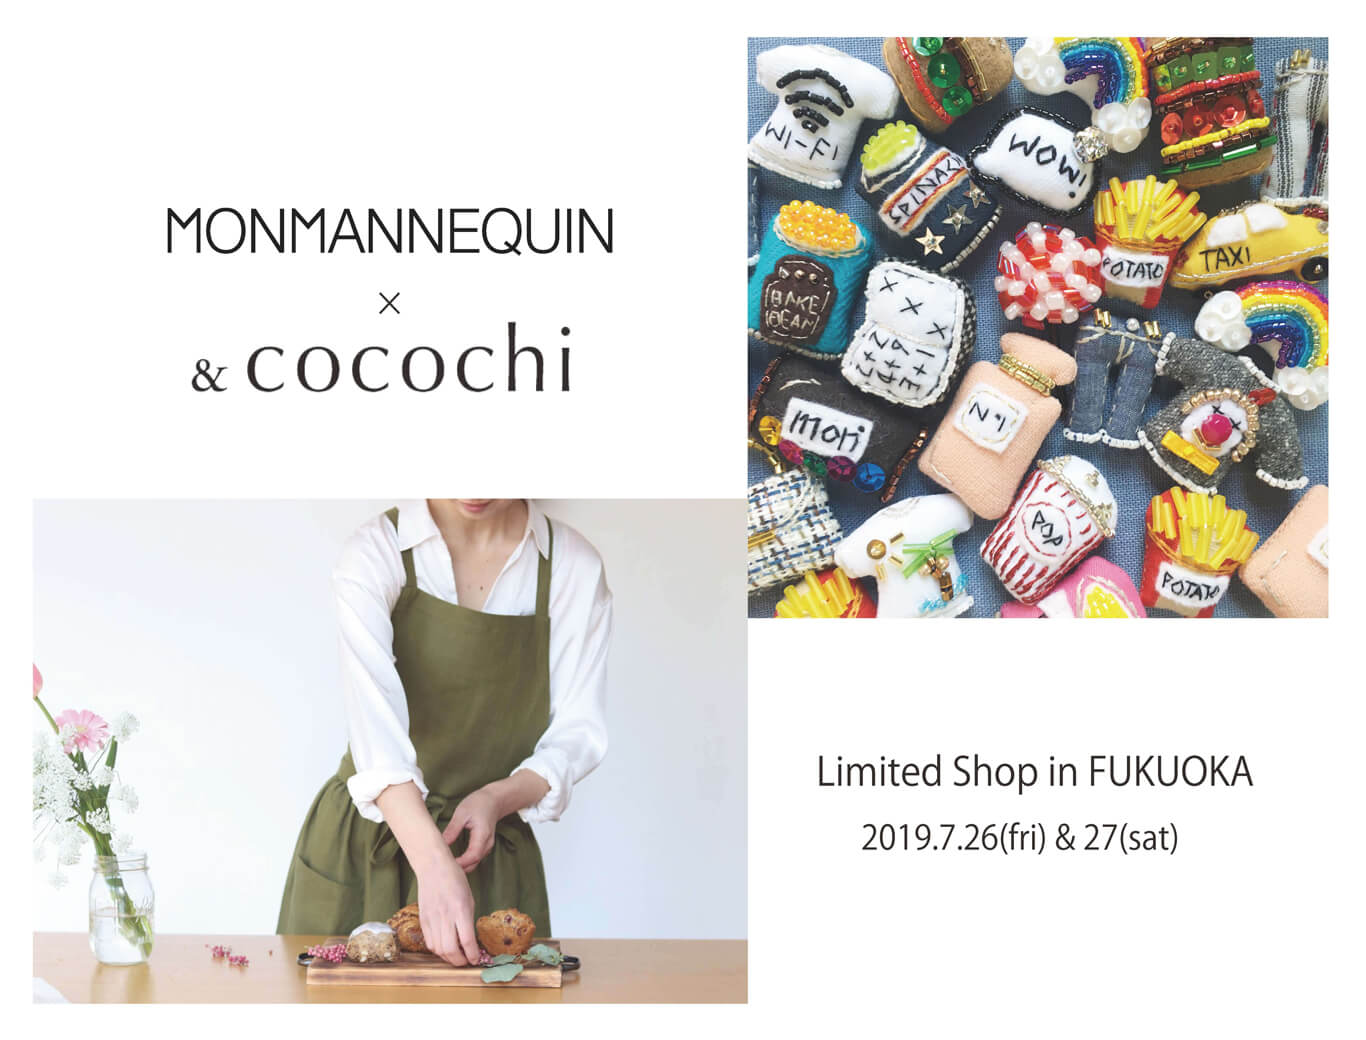 enlc-201907-monmannequin&cocochi-展覧会